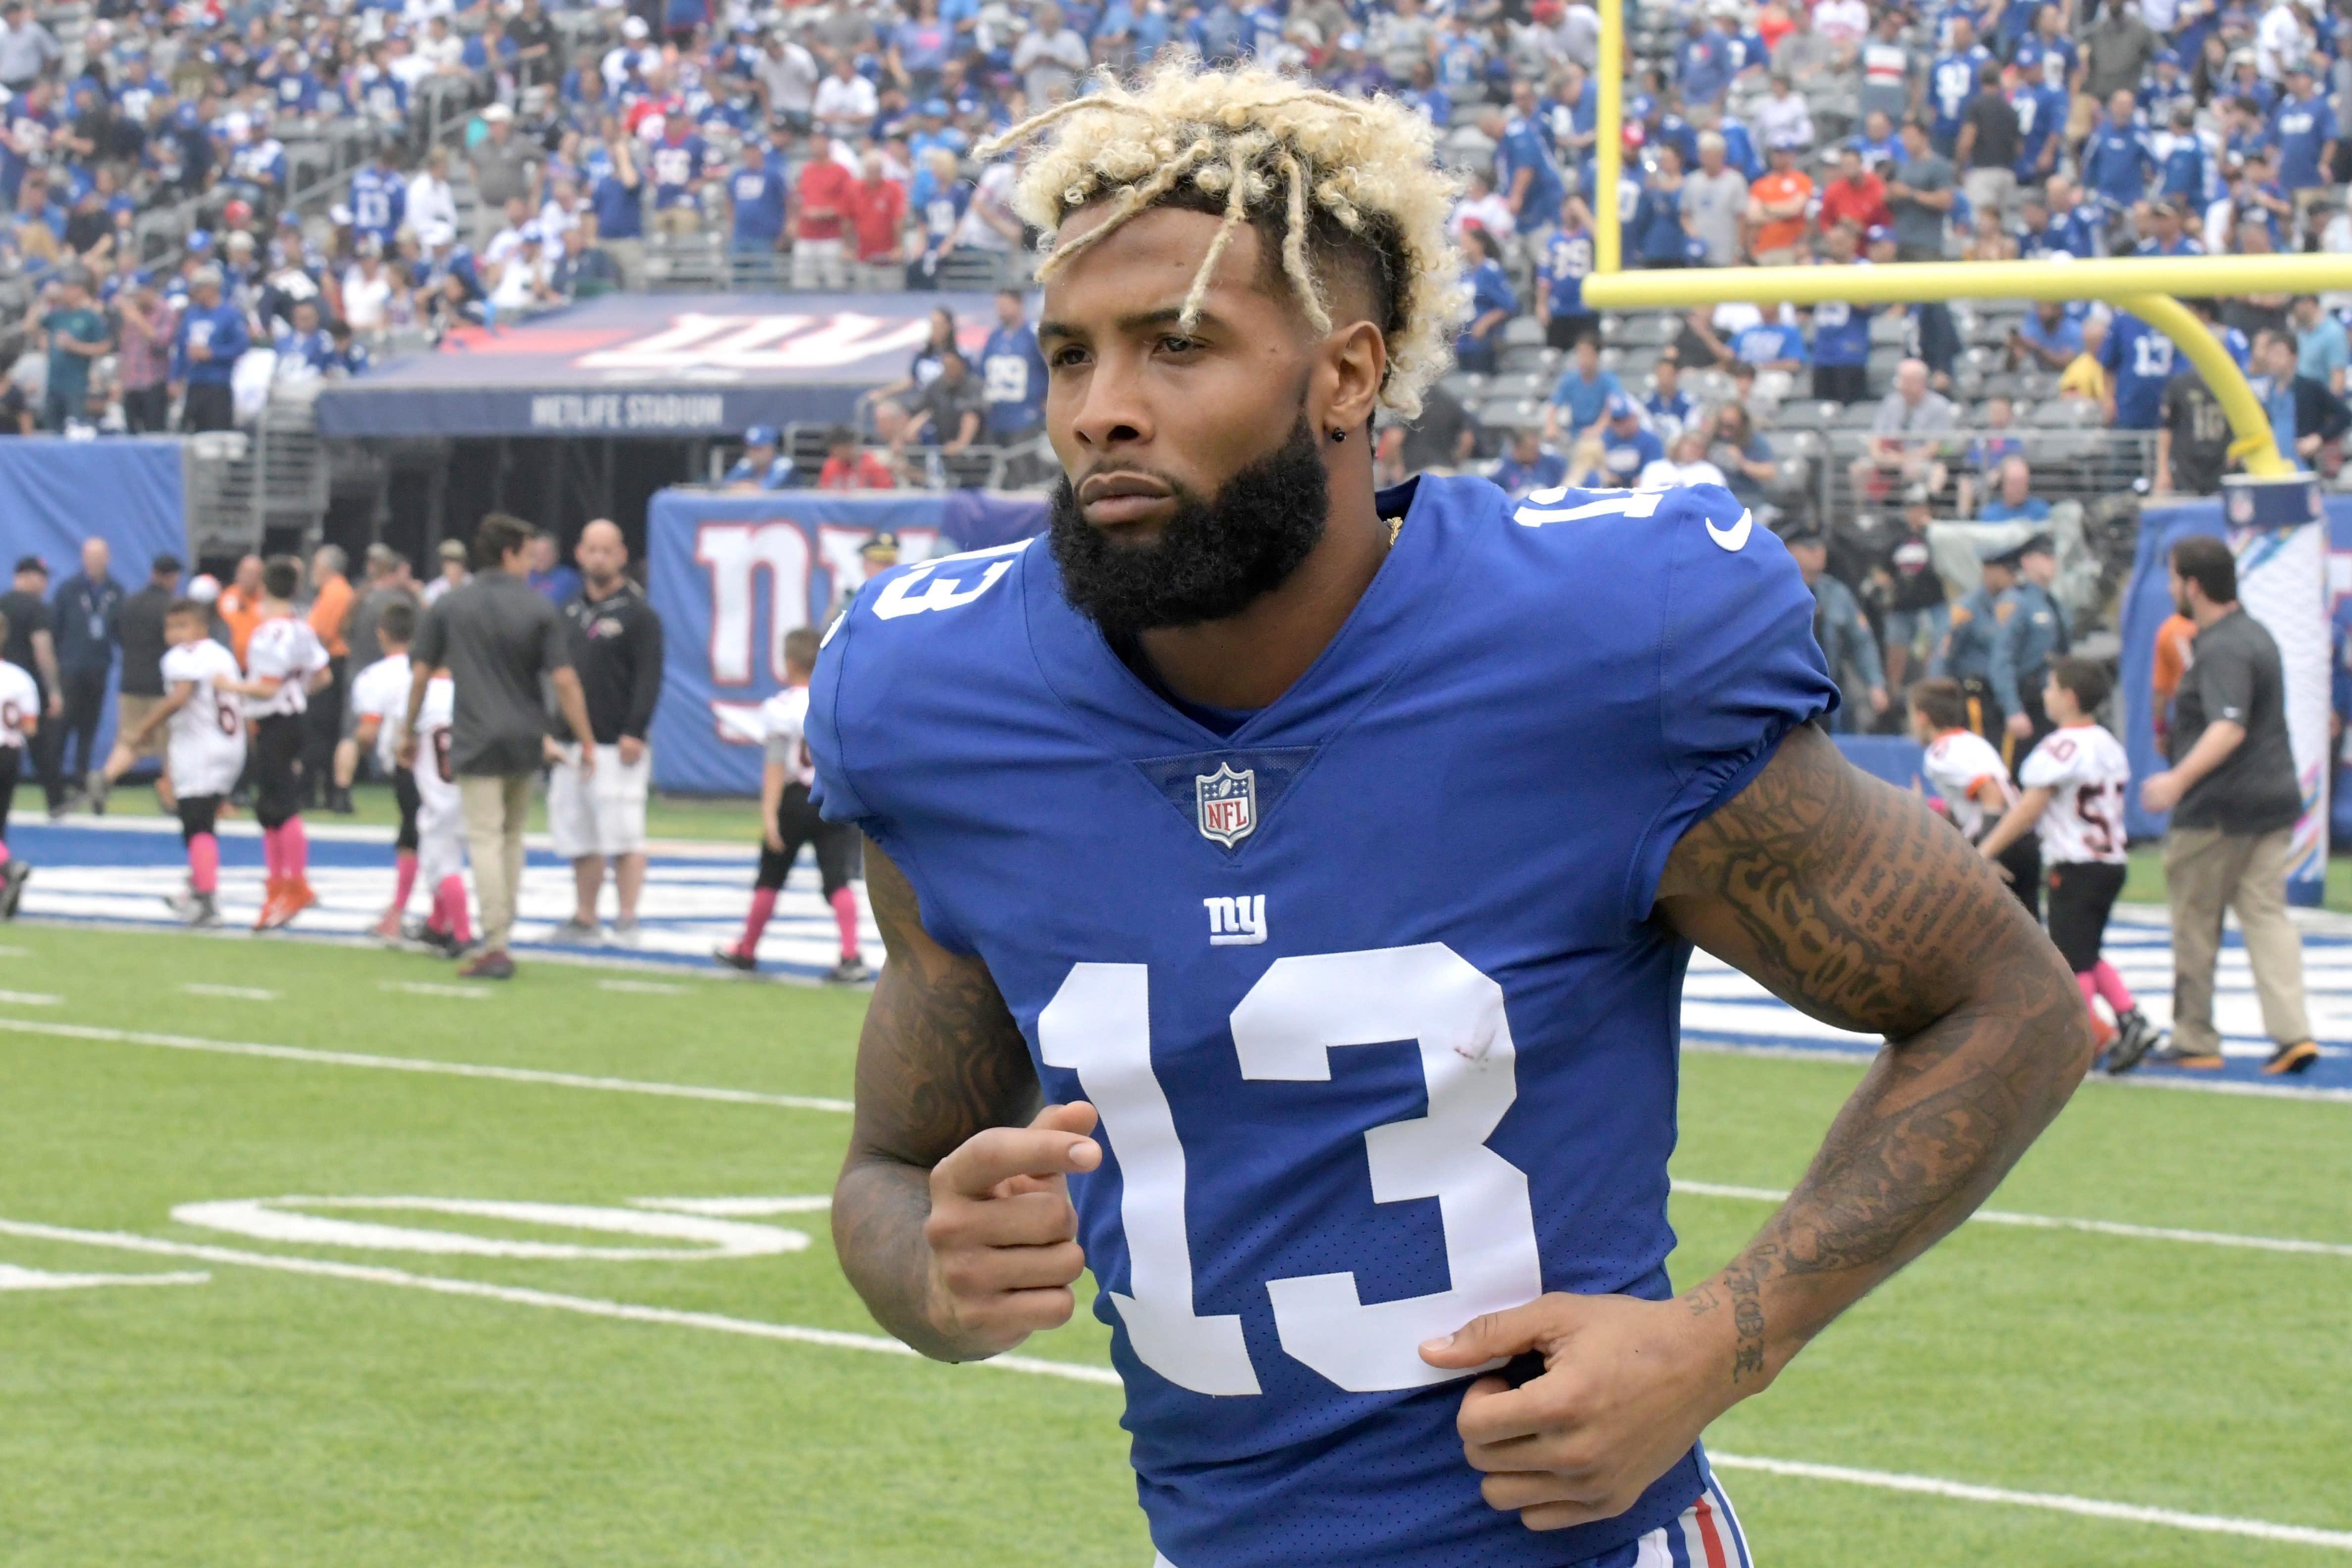 Pat Shurmur: Odell Beckham Jr. will 'absolutely' be part of Giants in 2018